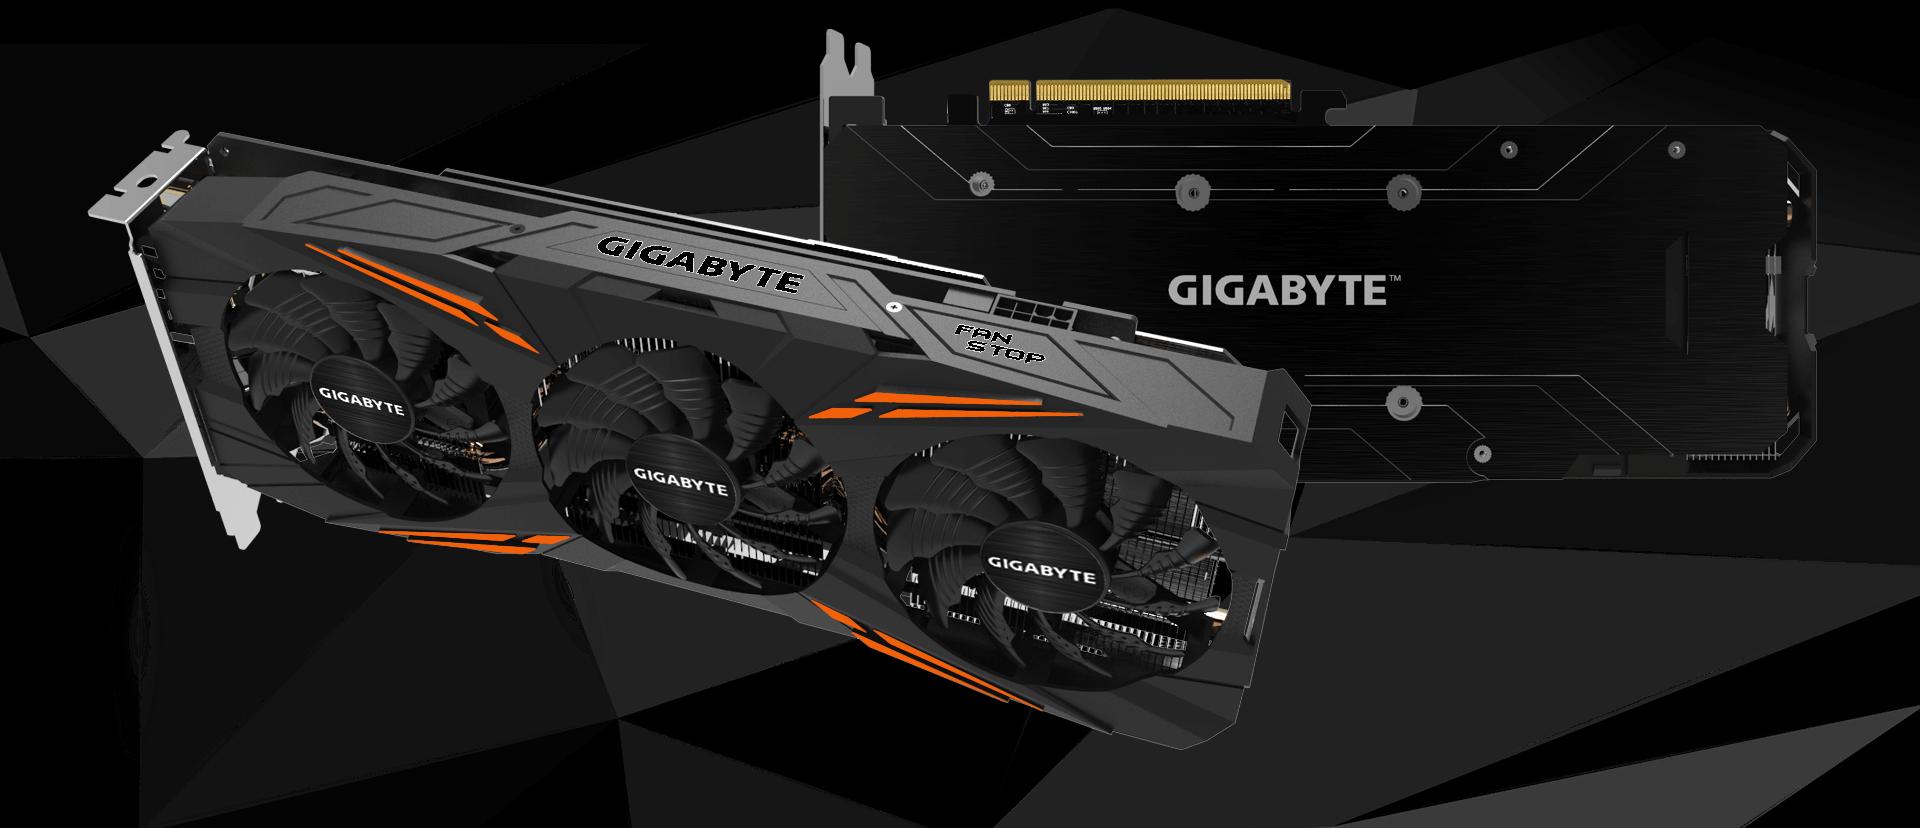 GeForce® GTX 1070 Ti Gaming 8G | Graphics Card - GIGABYTE Global